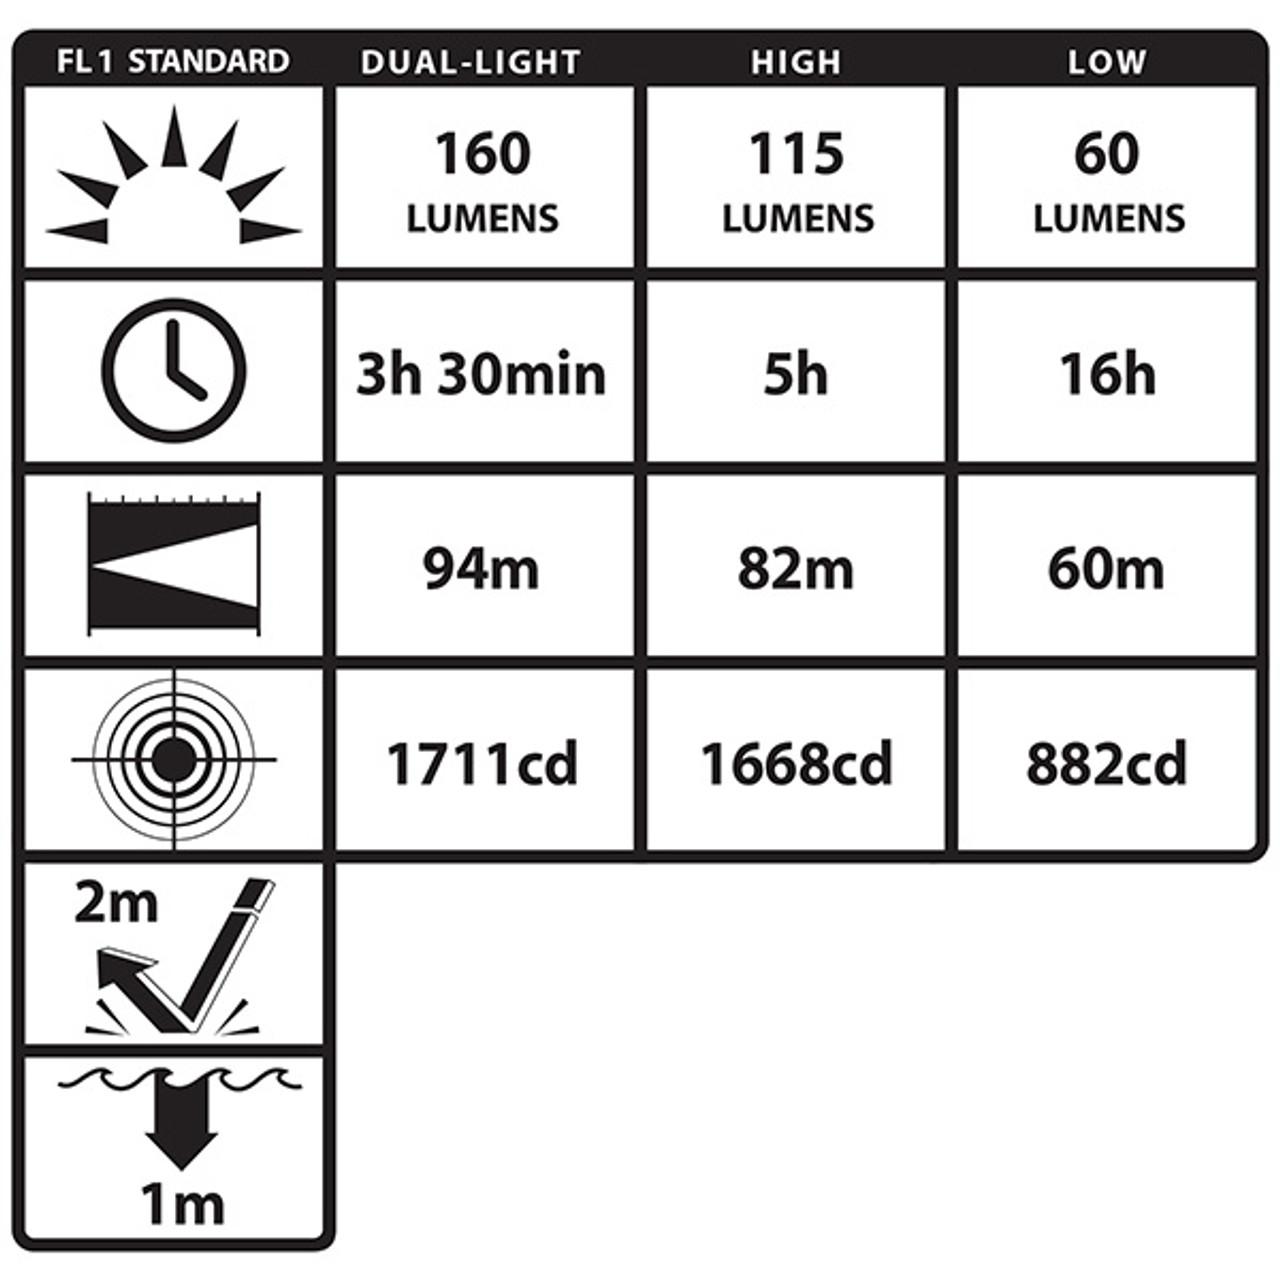 Green LED Dual-Light Headlamp